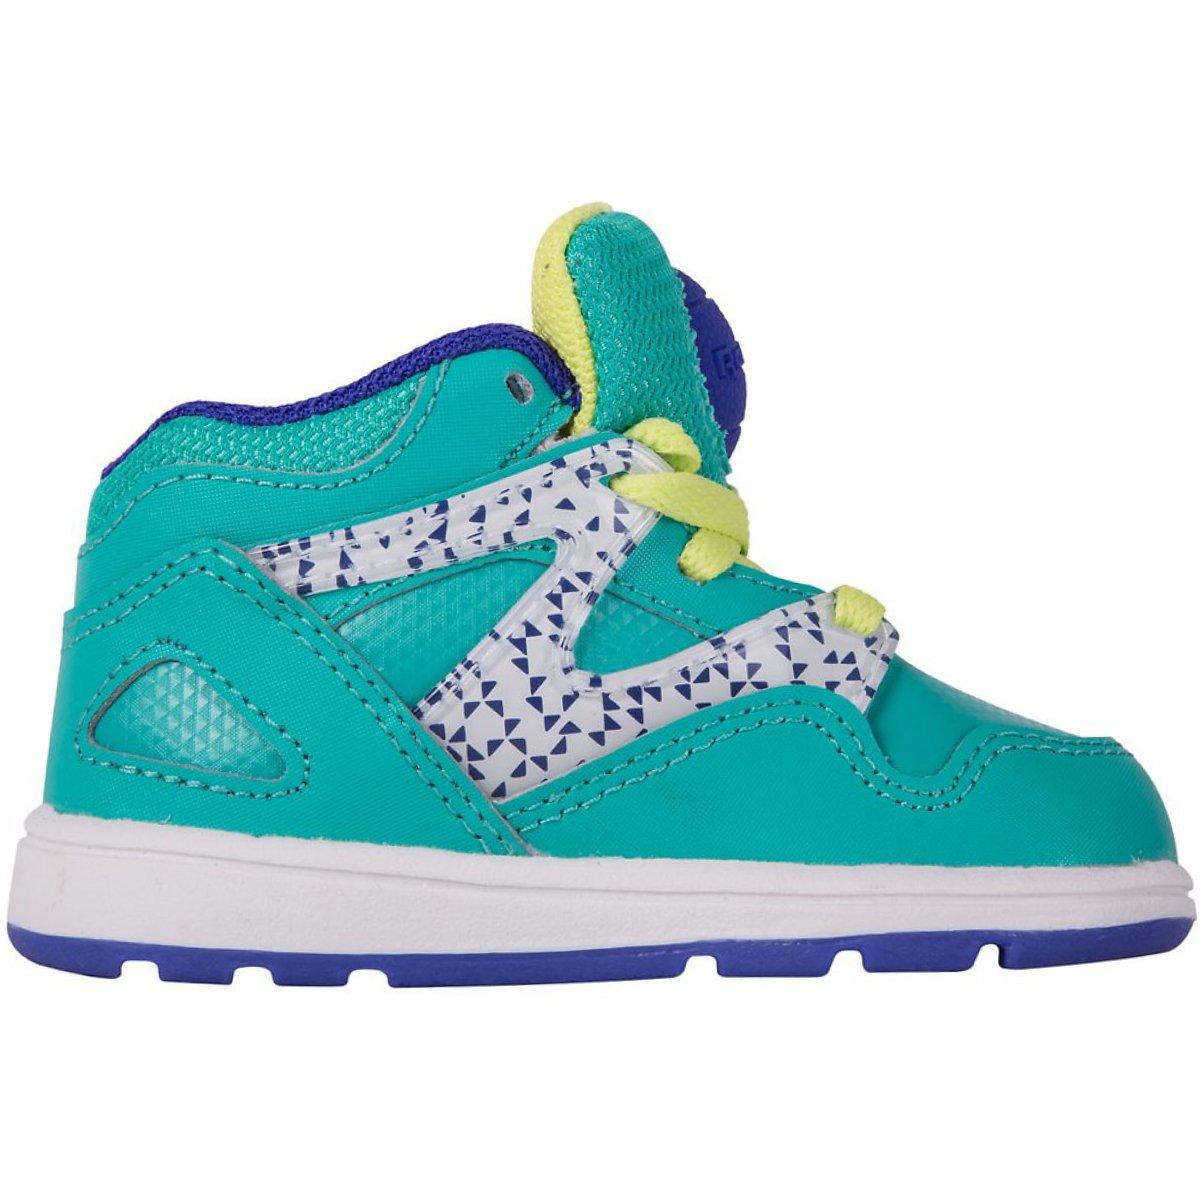 3f17438715ea Reebok Versa Pump Omni Lite Kids Shoes Turquoise Size  7.5  Amazon.co.uk   Shoes   Bags